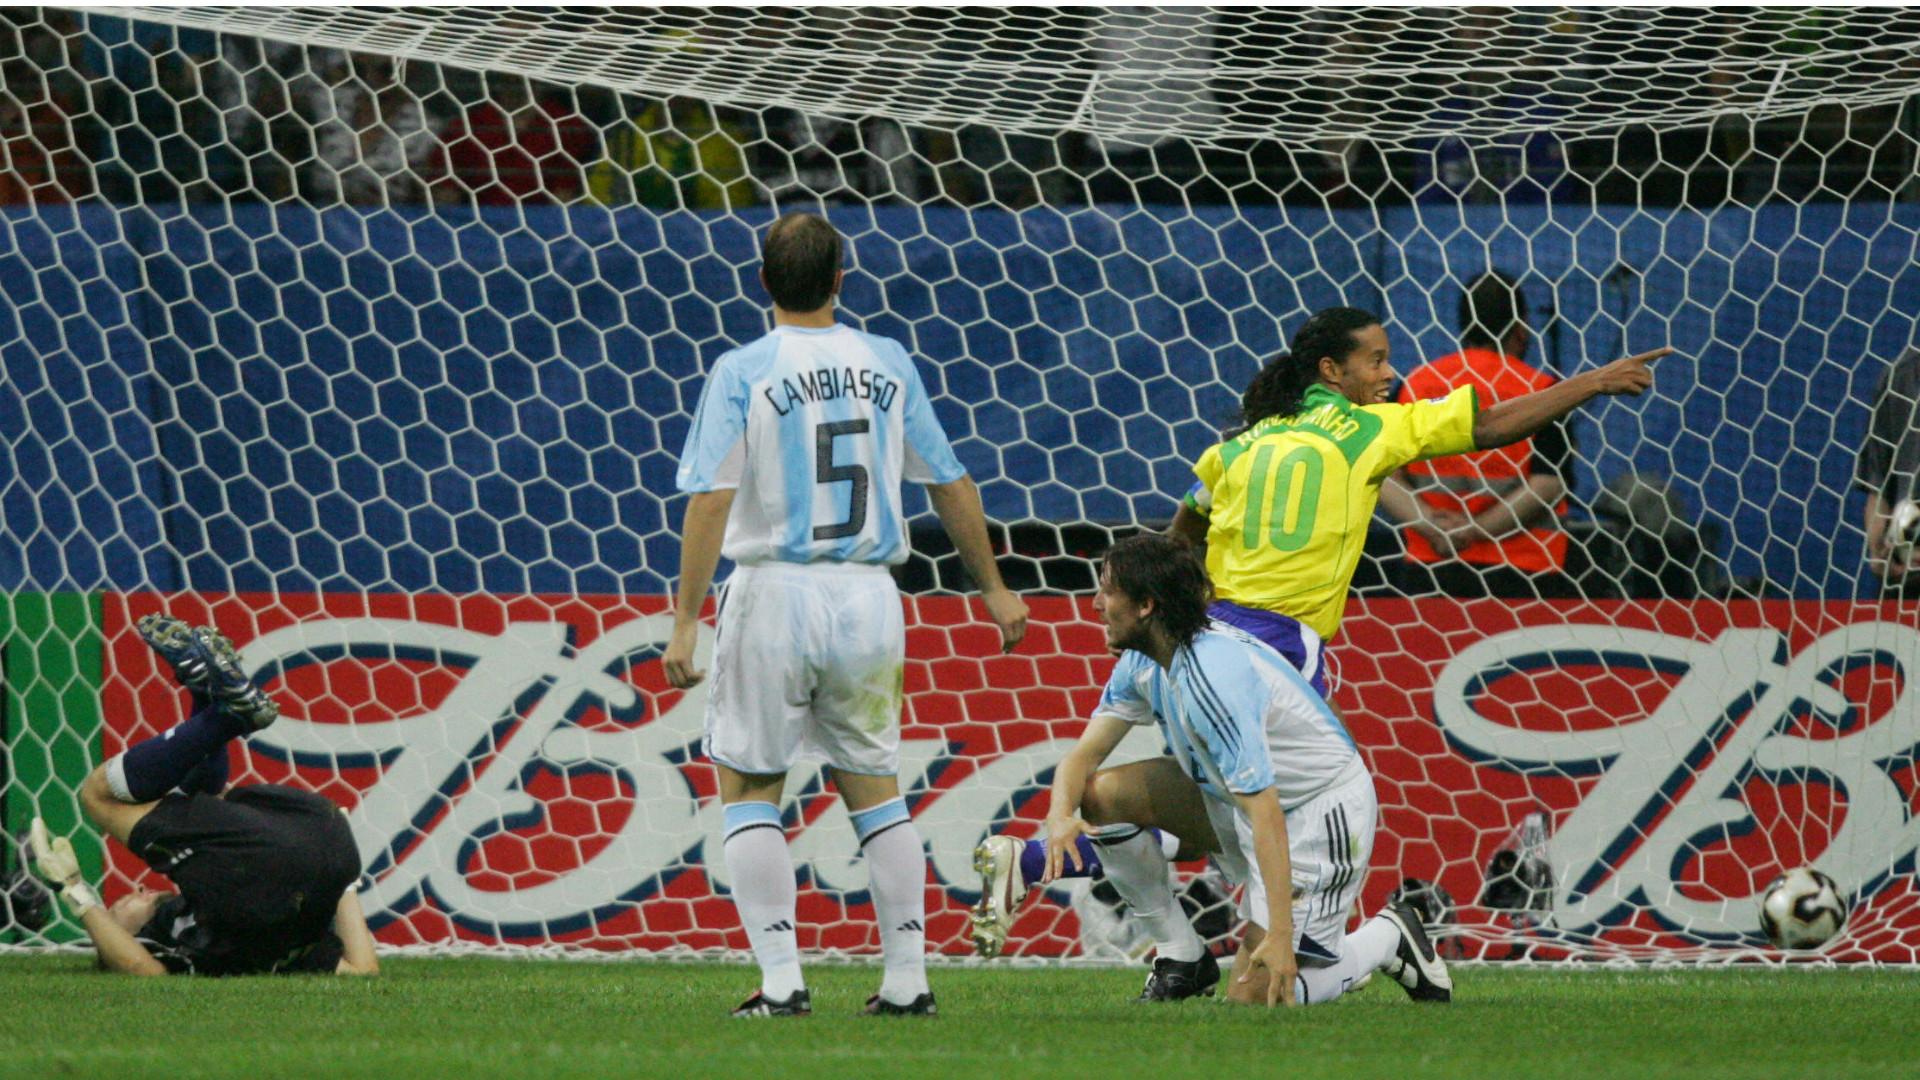 ronaldinho-argentina-brasil-confederations-cup-2005_1vvqij7y24xgq1mnlp47hartp1